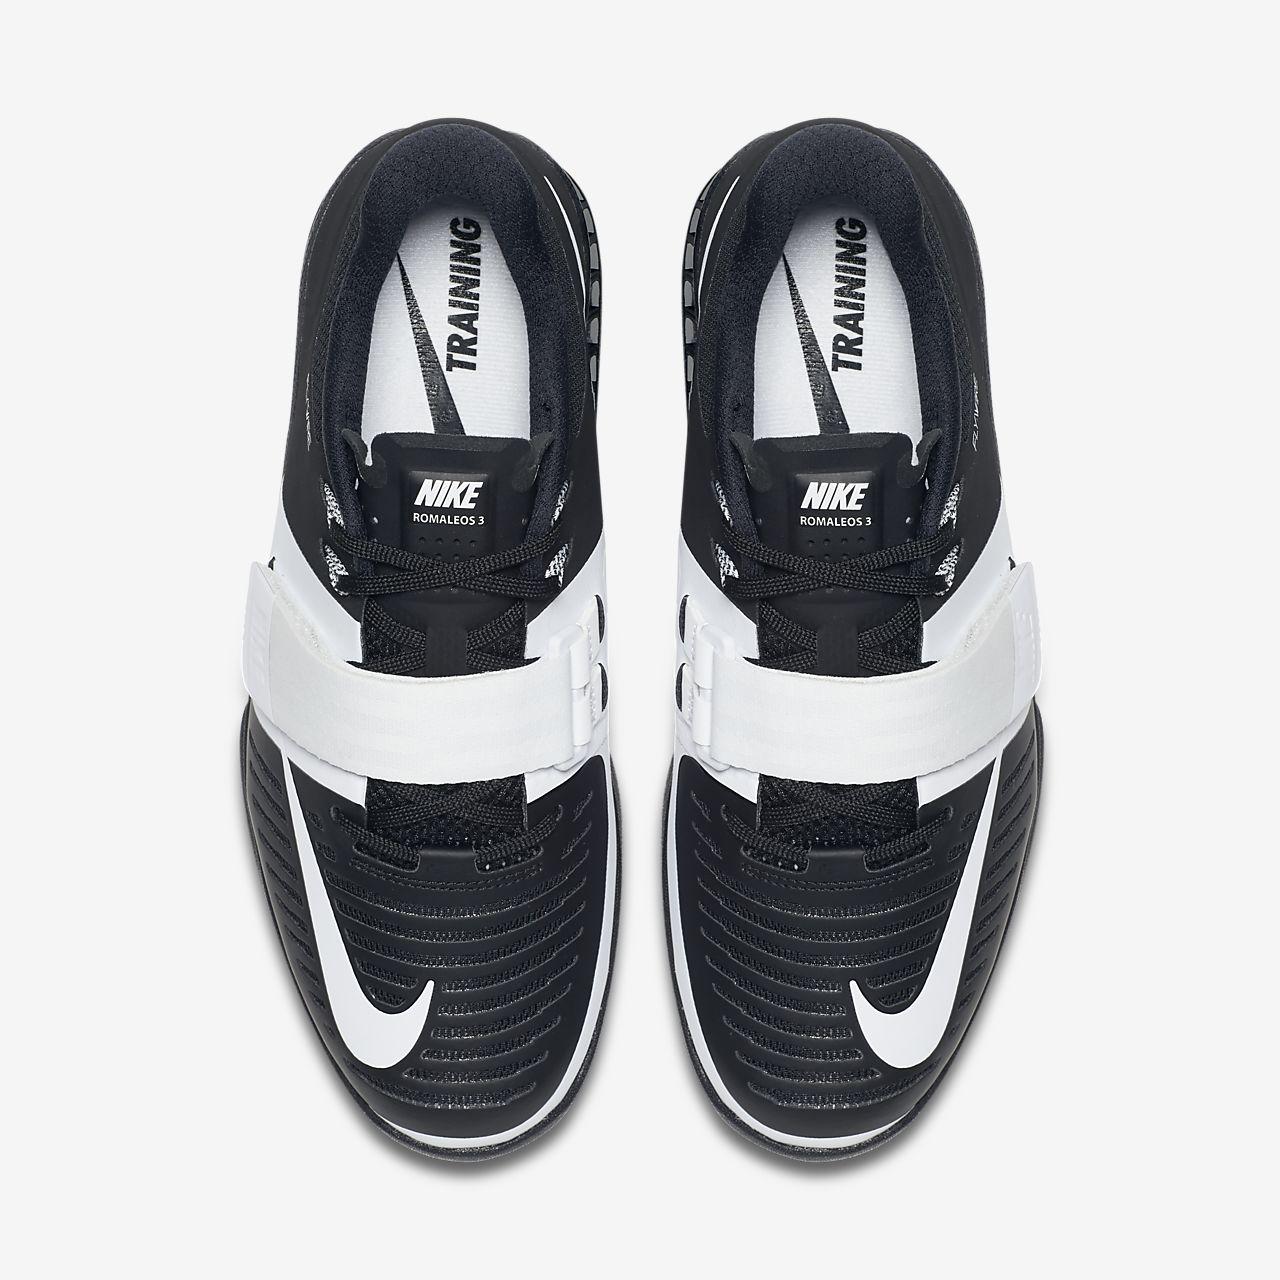 scarpe nike romaleos